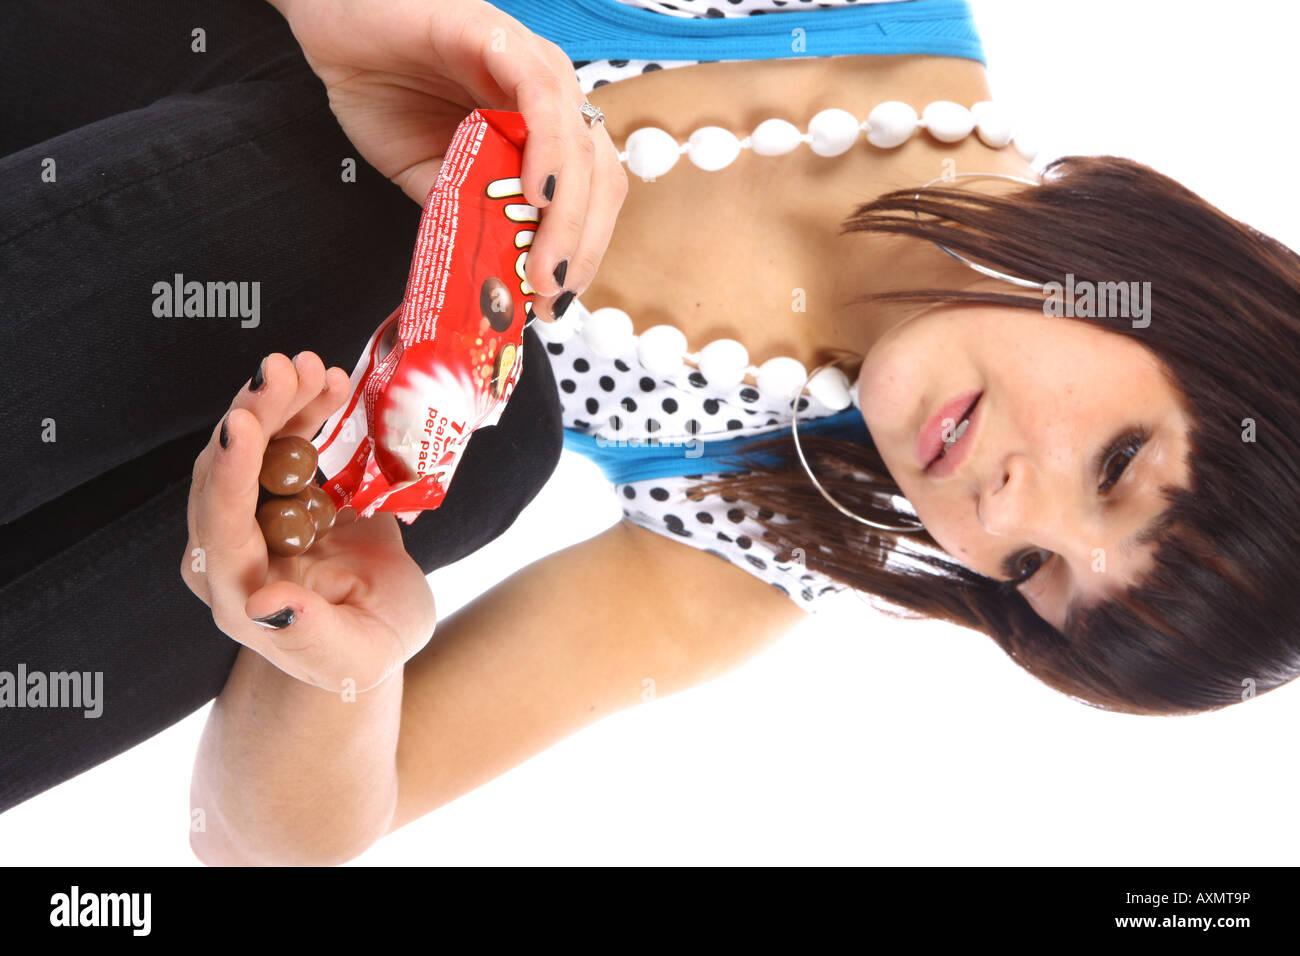 Teenage Girl Eating Chocolate Model Released Stock Photo, Royalty ...